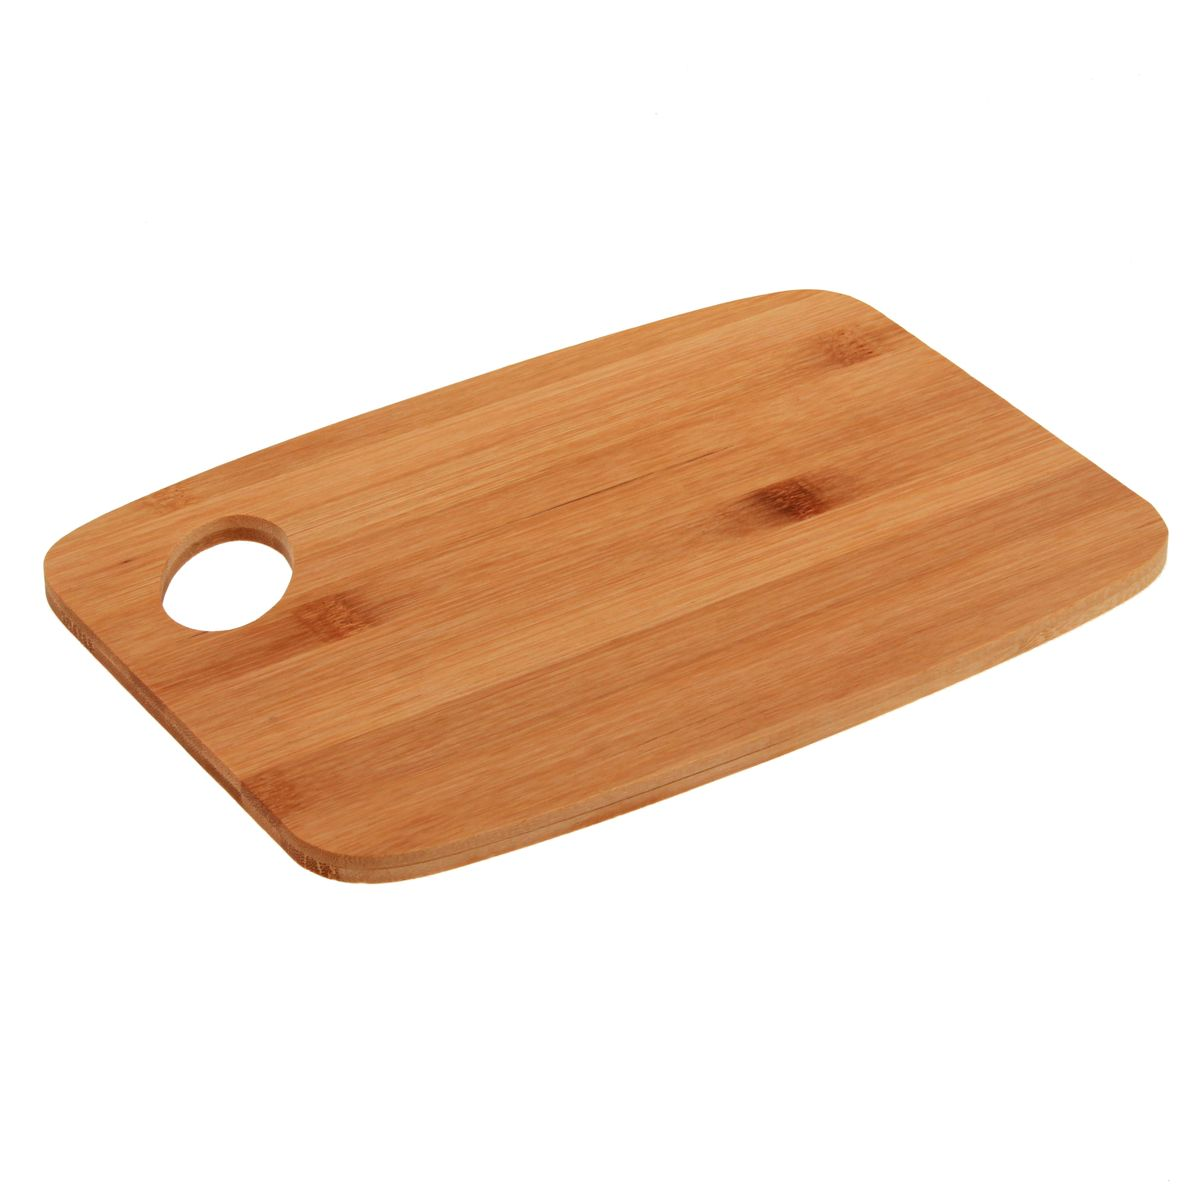 Planche bambou avec manche 26.5 x 18.5 x 1 cm - Zeller